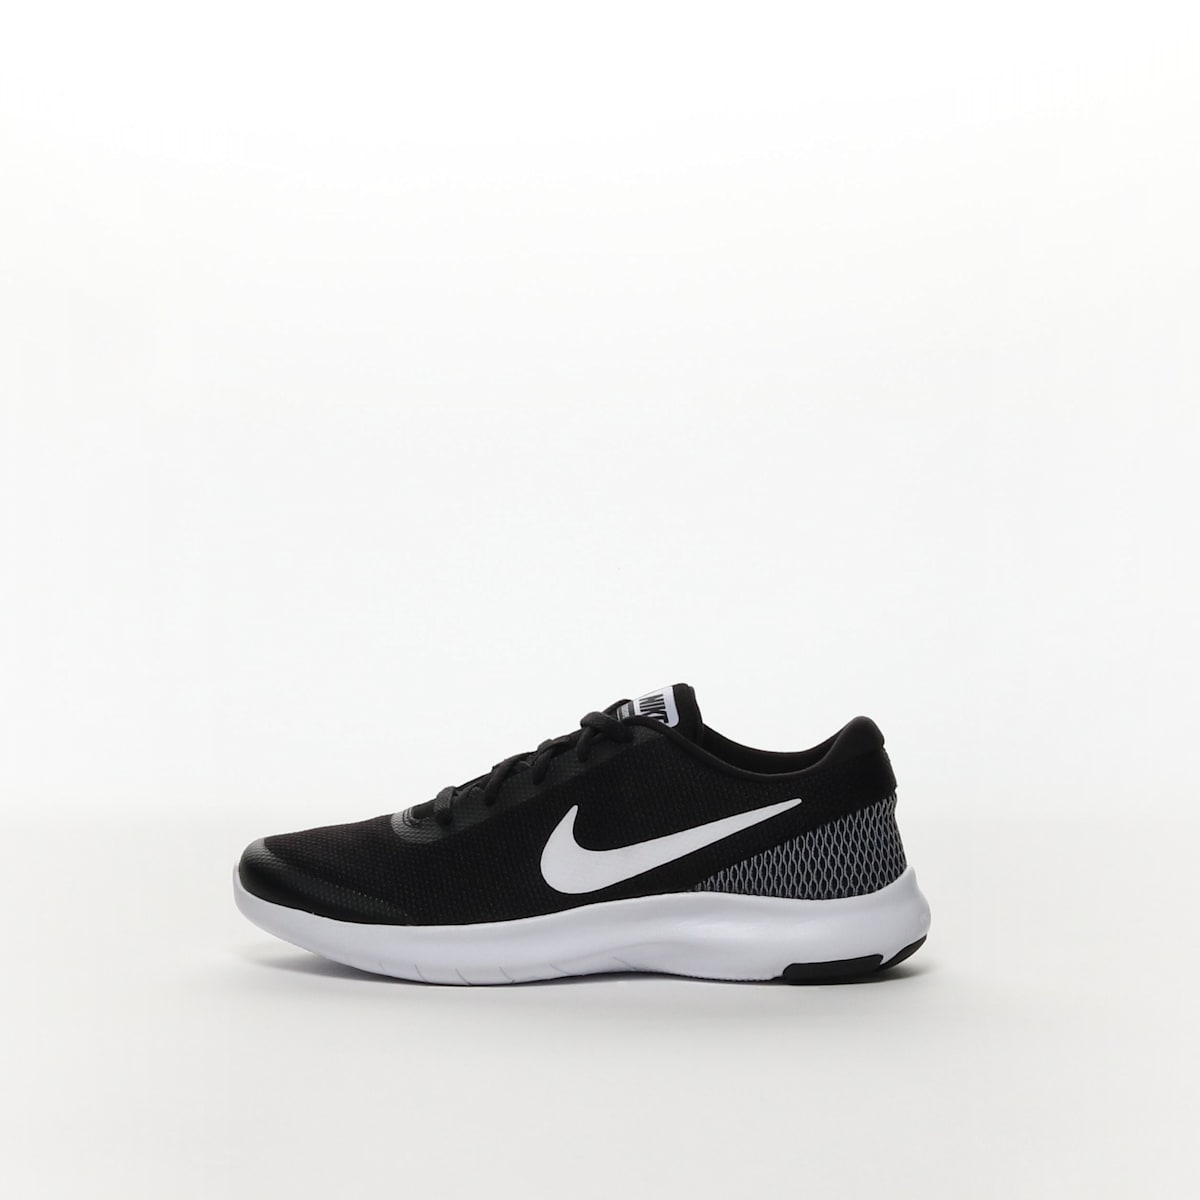 c9f0ff7e10bee Women s Nike Flex Experience RN 7 (W) Running Shoe - BLACK WHITE ...